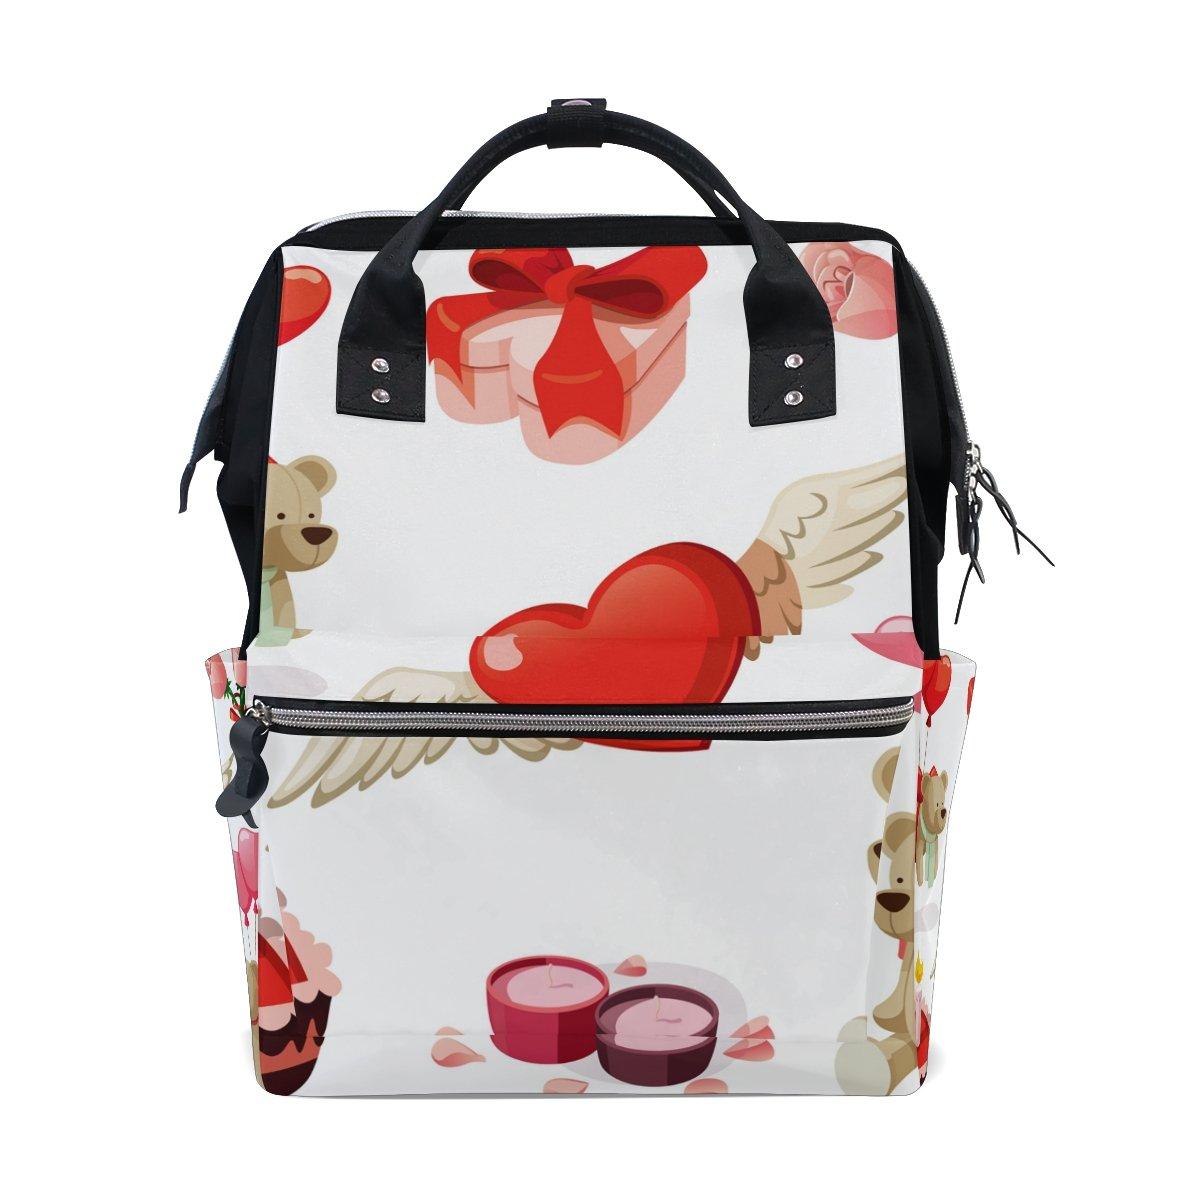 Backpack School Bag Wedding Heart Bear Rose Canvas Travel Doctor Style Daypack